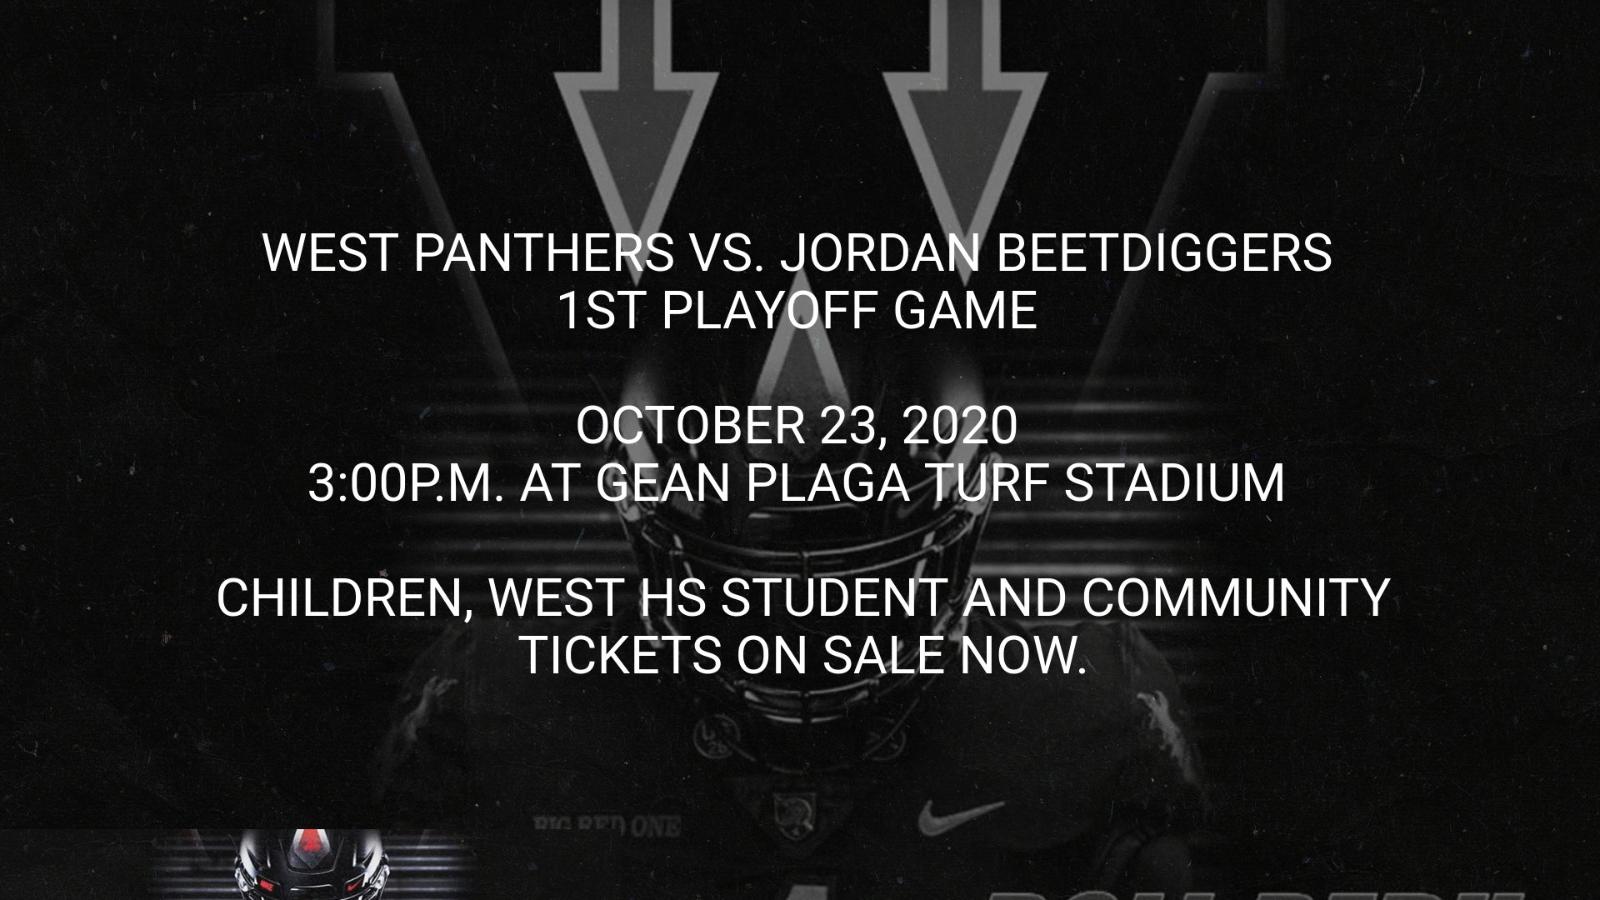 West Panthers vs. Jordan Beetdiggers